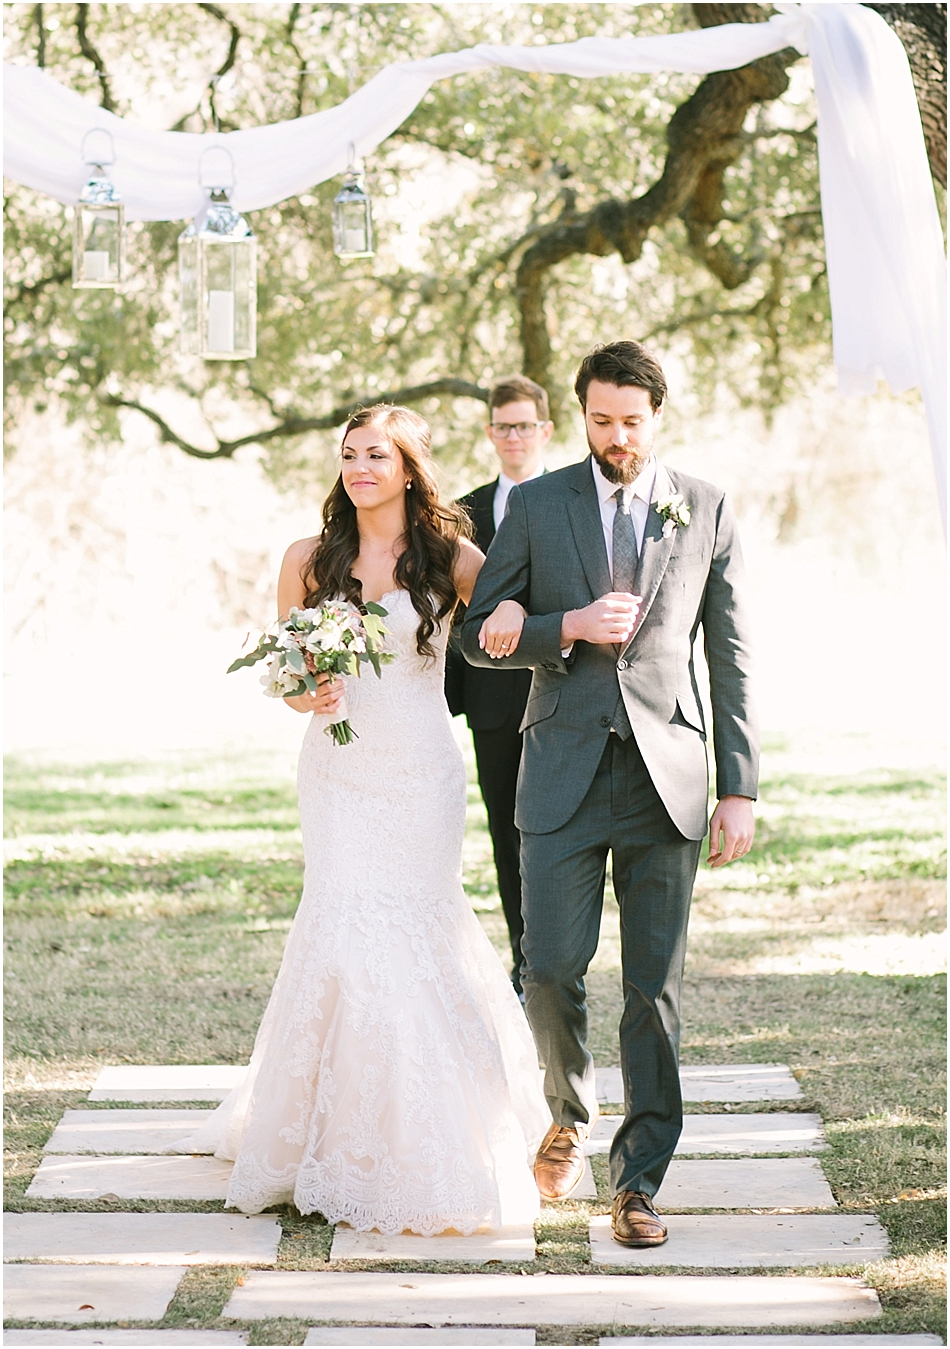 Central Texas Wedding   Vineyards at Chappel Lodge   Fine Art   Emilie Anne Photography-2.jpg